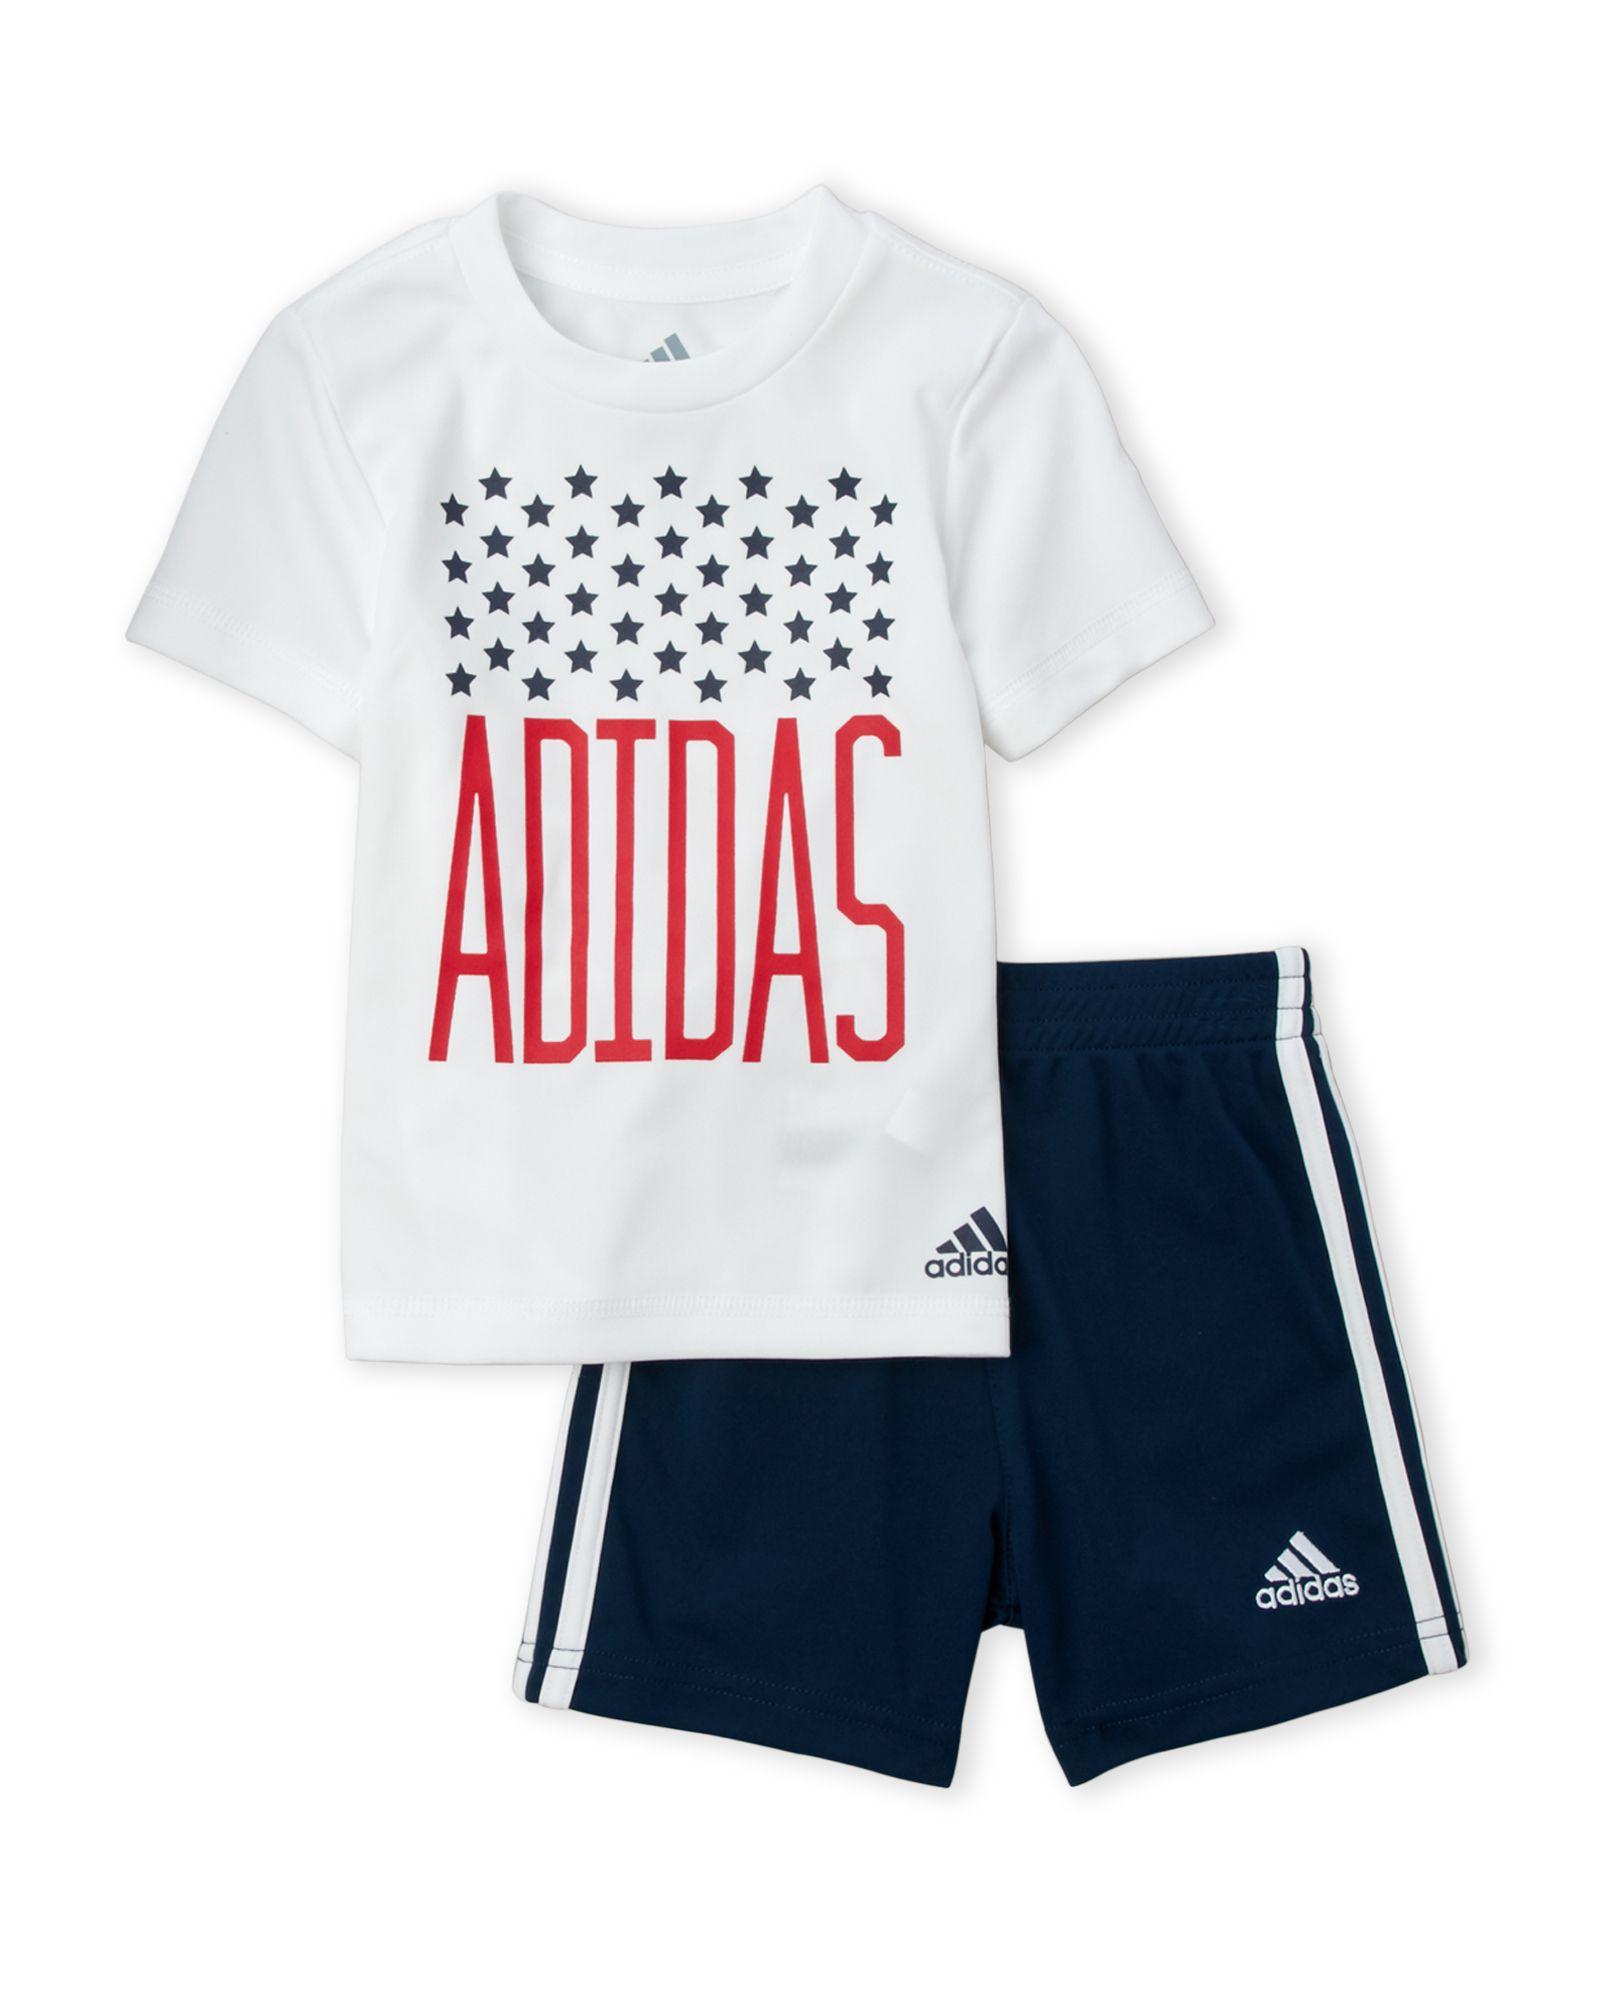 2f648d0d Infant Boys) Two-Piece White Logo Tee & Navy Shorts Set   *Apparel ...